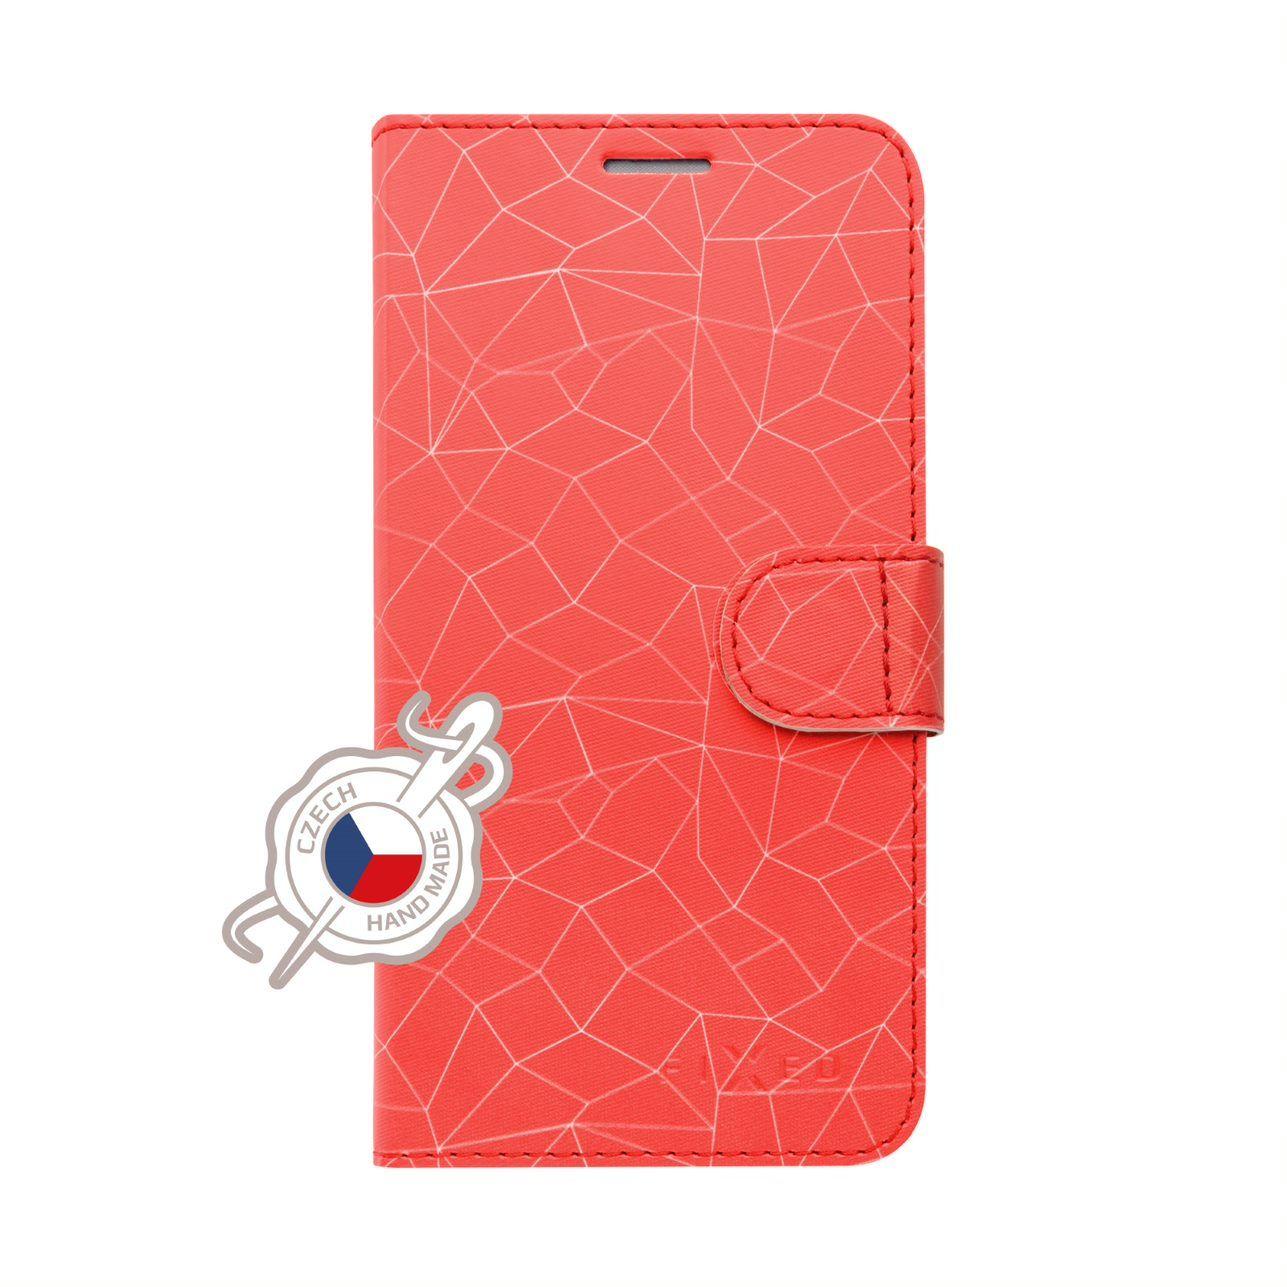 Pouzdro typu kniha FIXED FIT pro Xiaomi Redmi Note 6 Pro, motiv Red Mesh